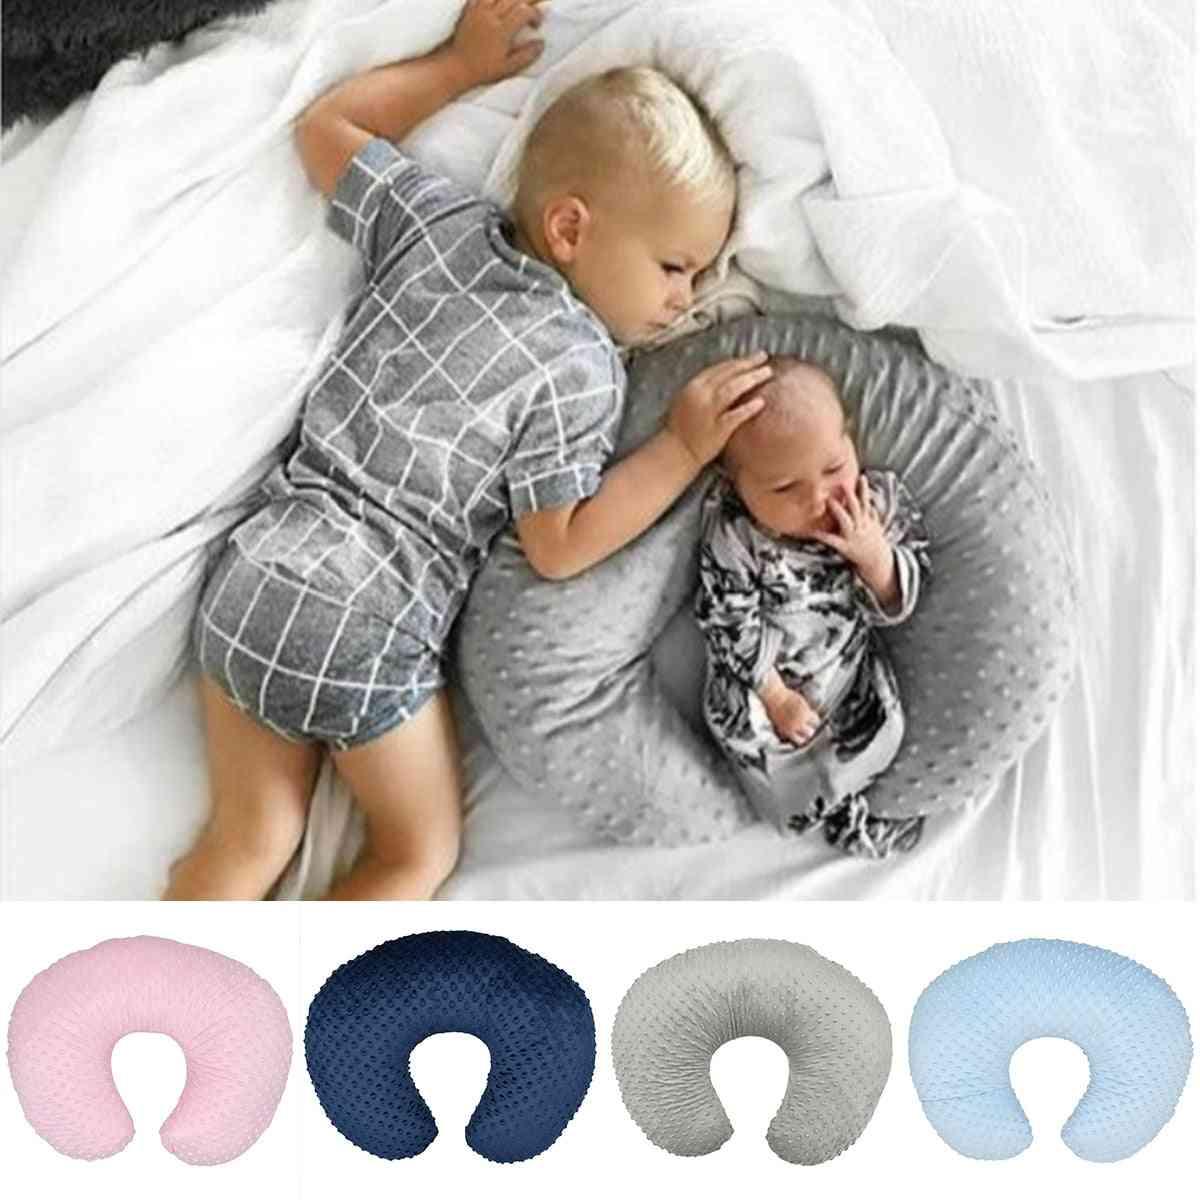 U-shaped U-shaped Breastfeeding, Soft Slip Pillow Cover